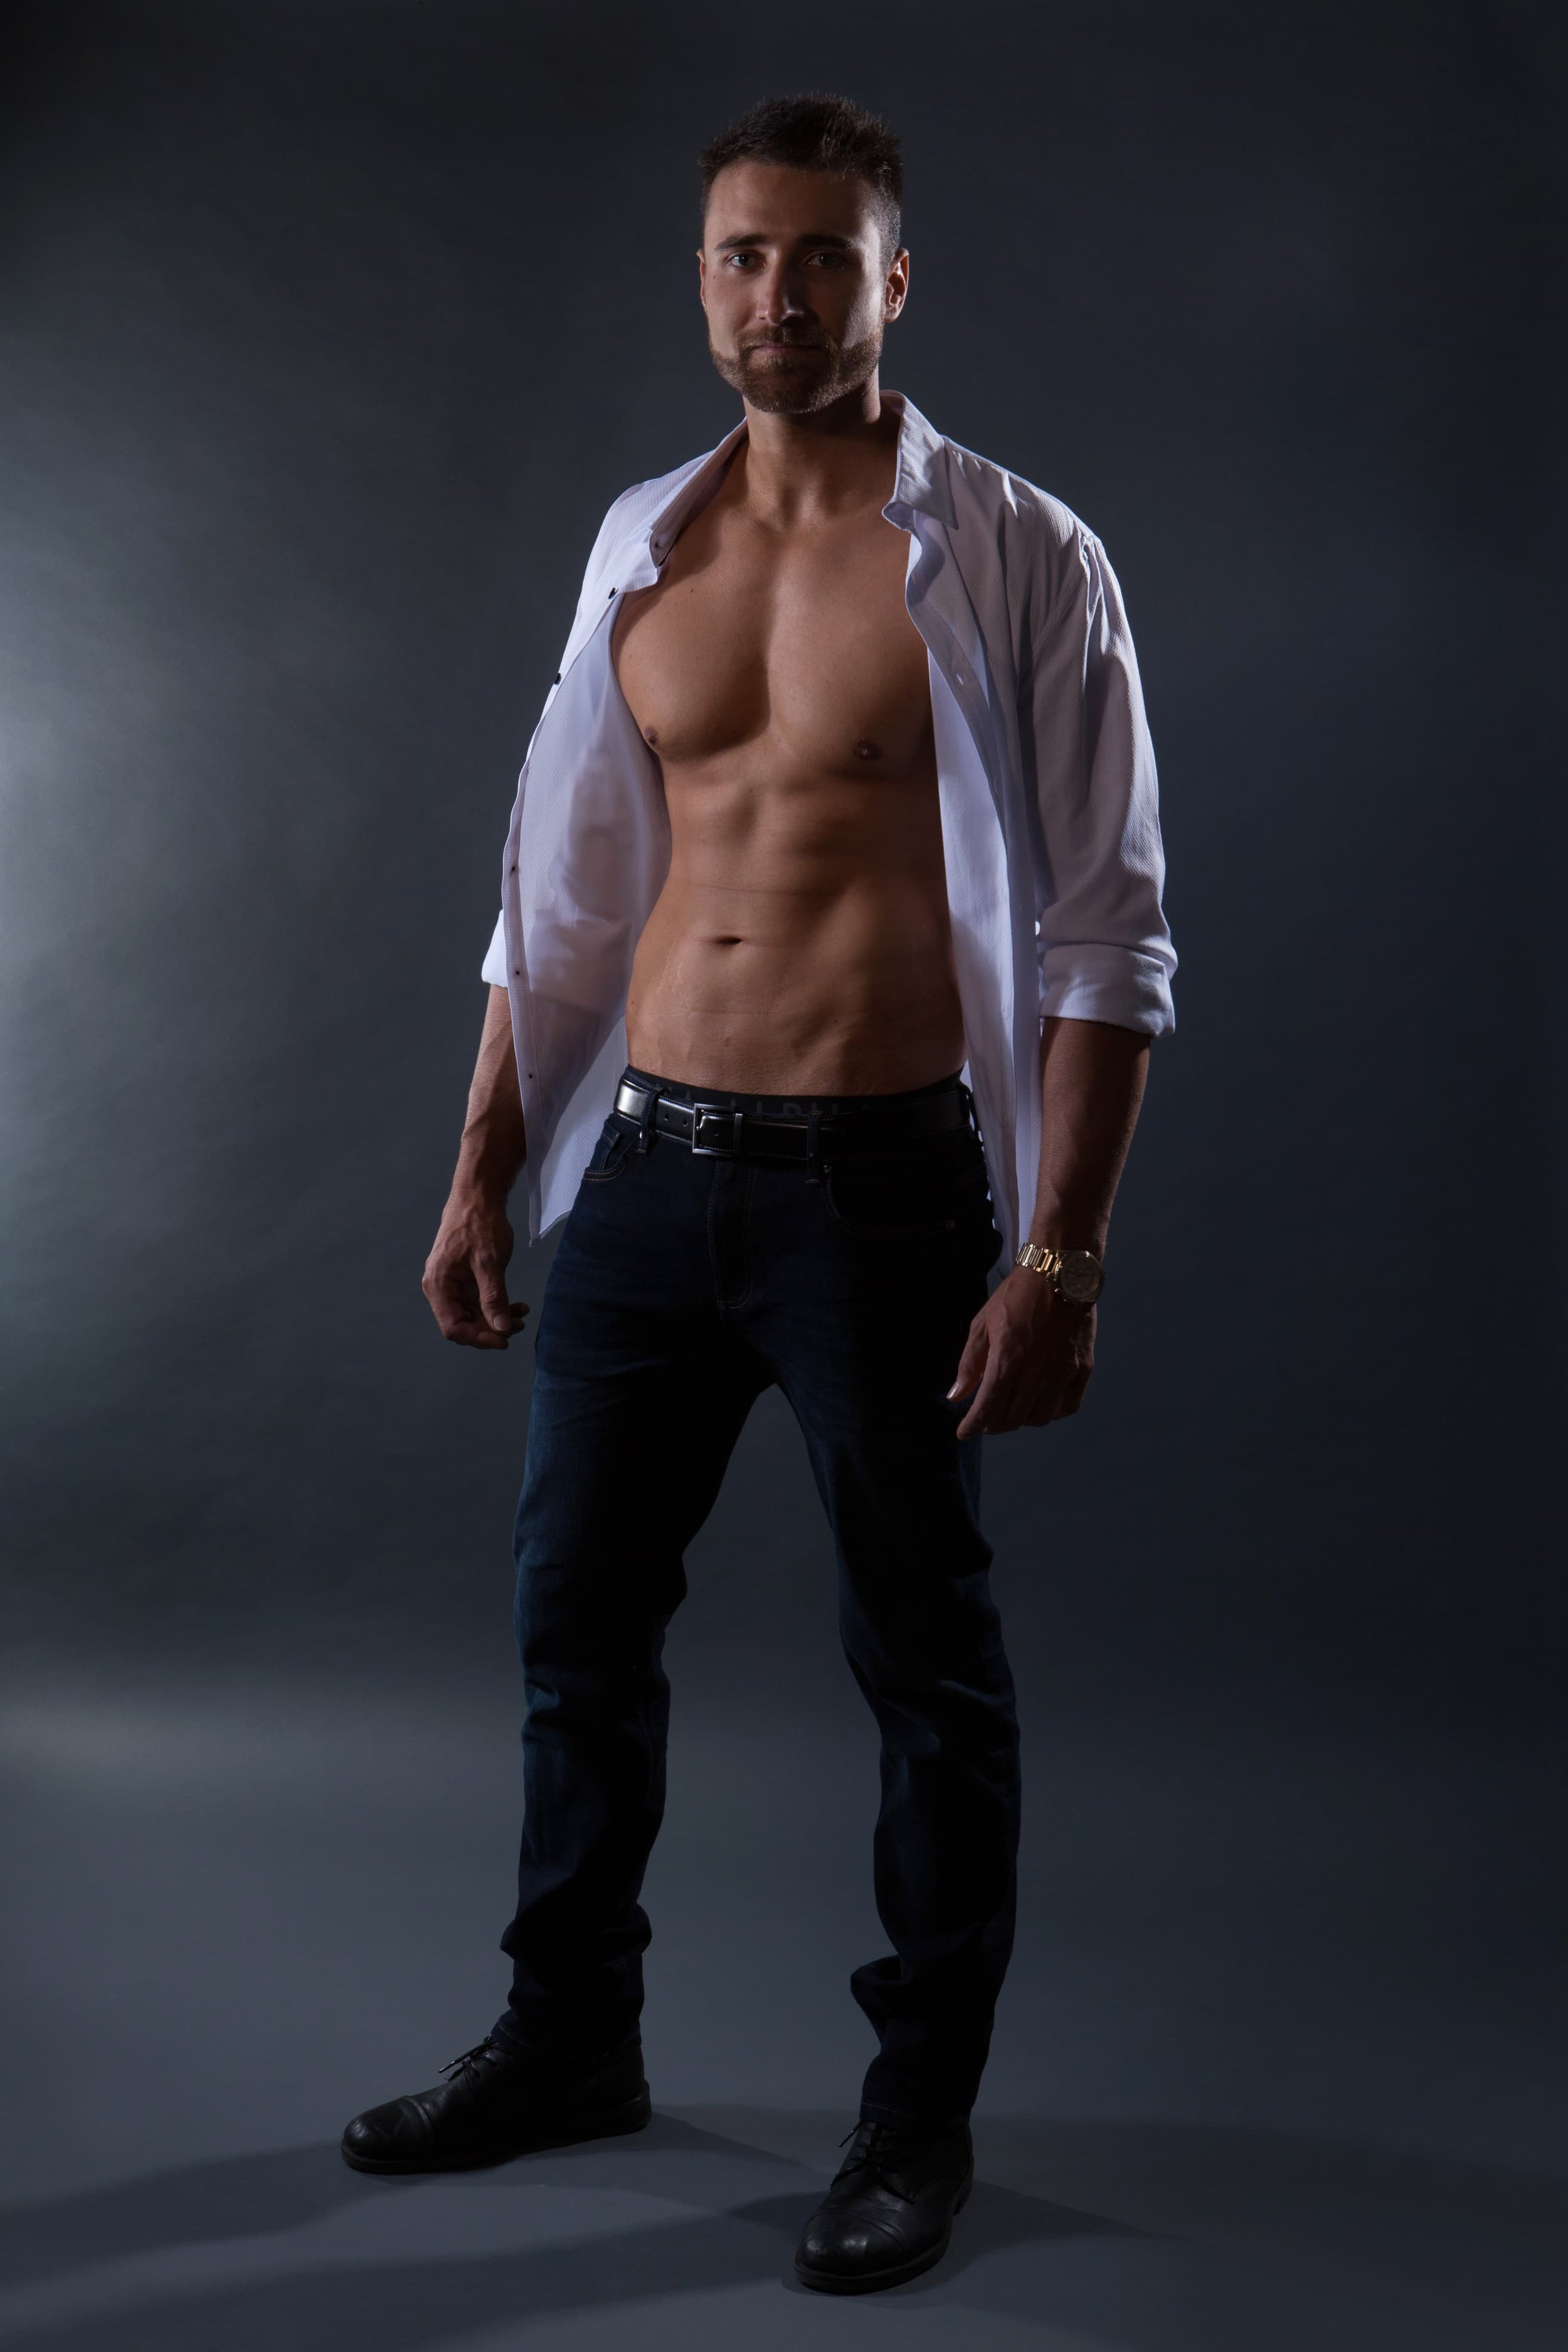 New zealand male topless waiter for hire in the gold coast, brisbane and byron bay. kiwi boy waitress. kiwi male stripper.